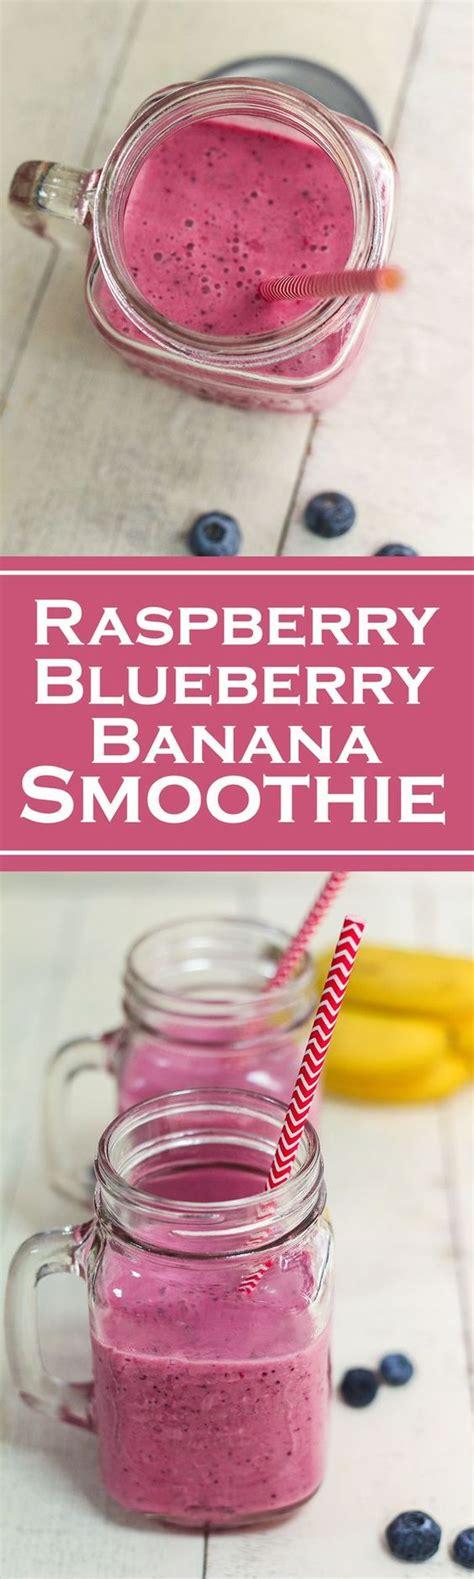 Blueberry Raspberry Detox Smoothie by Raspberry Blueberry Banana Smoothie Recipe Read More